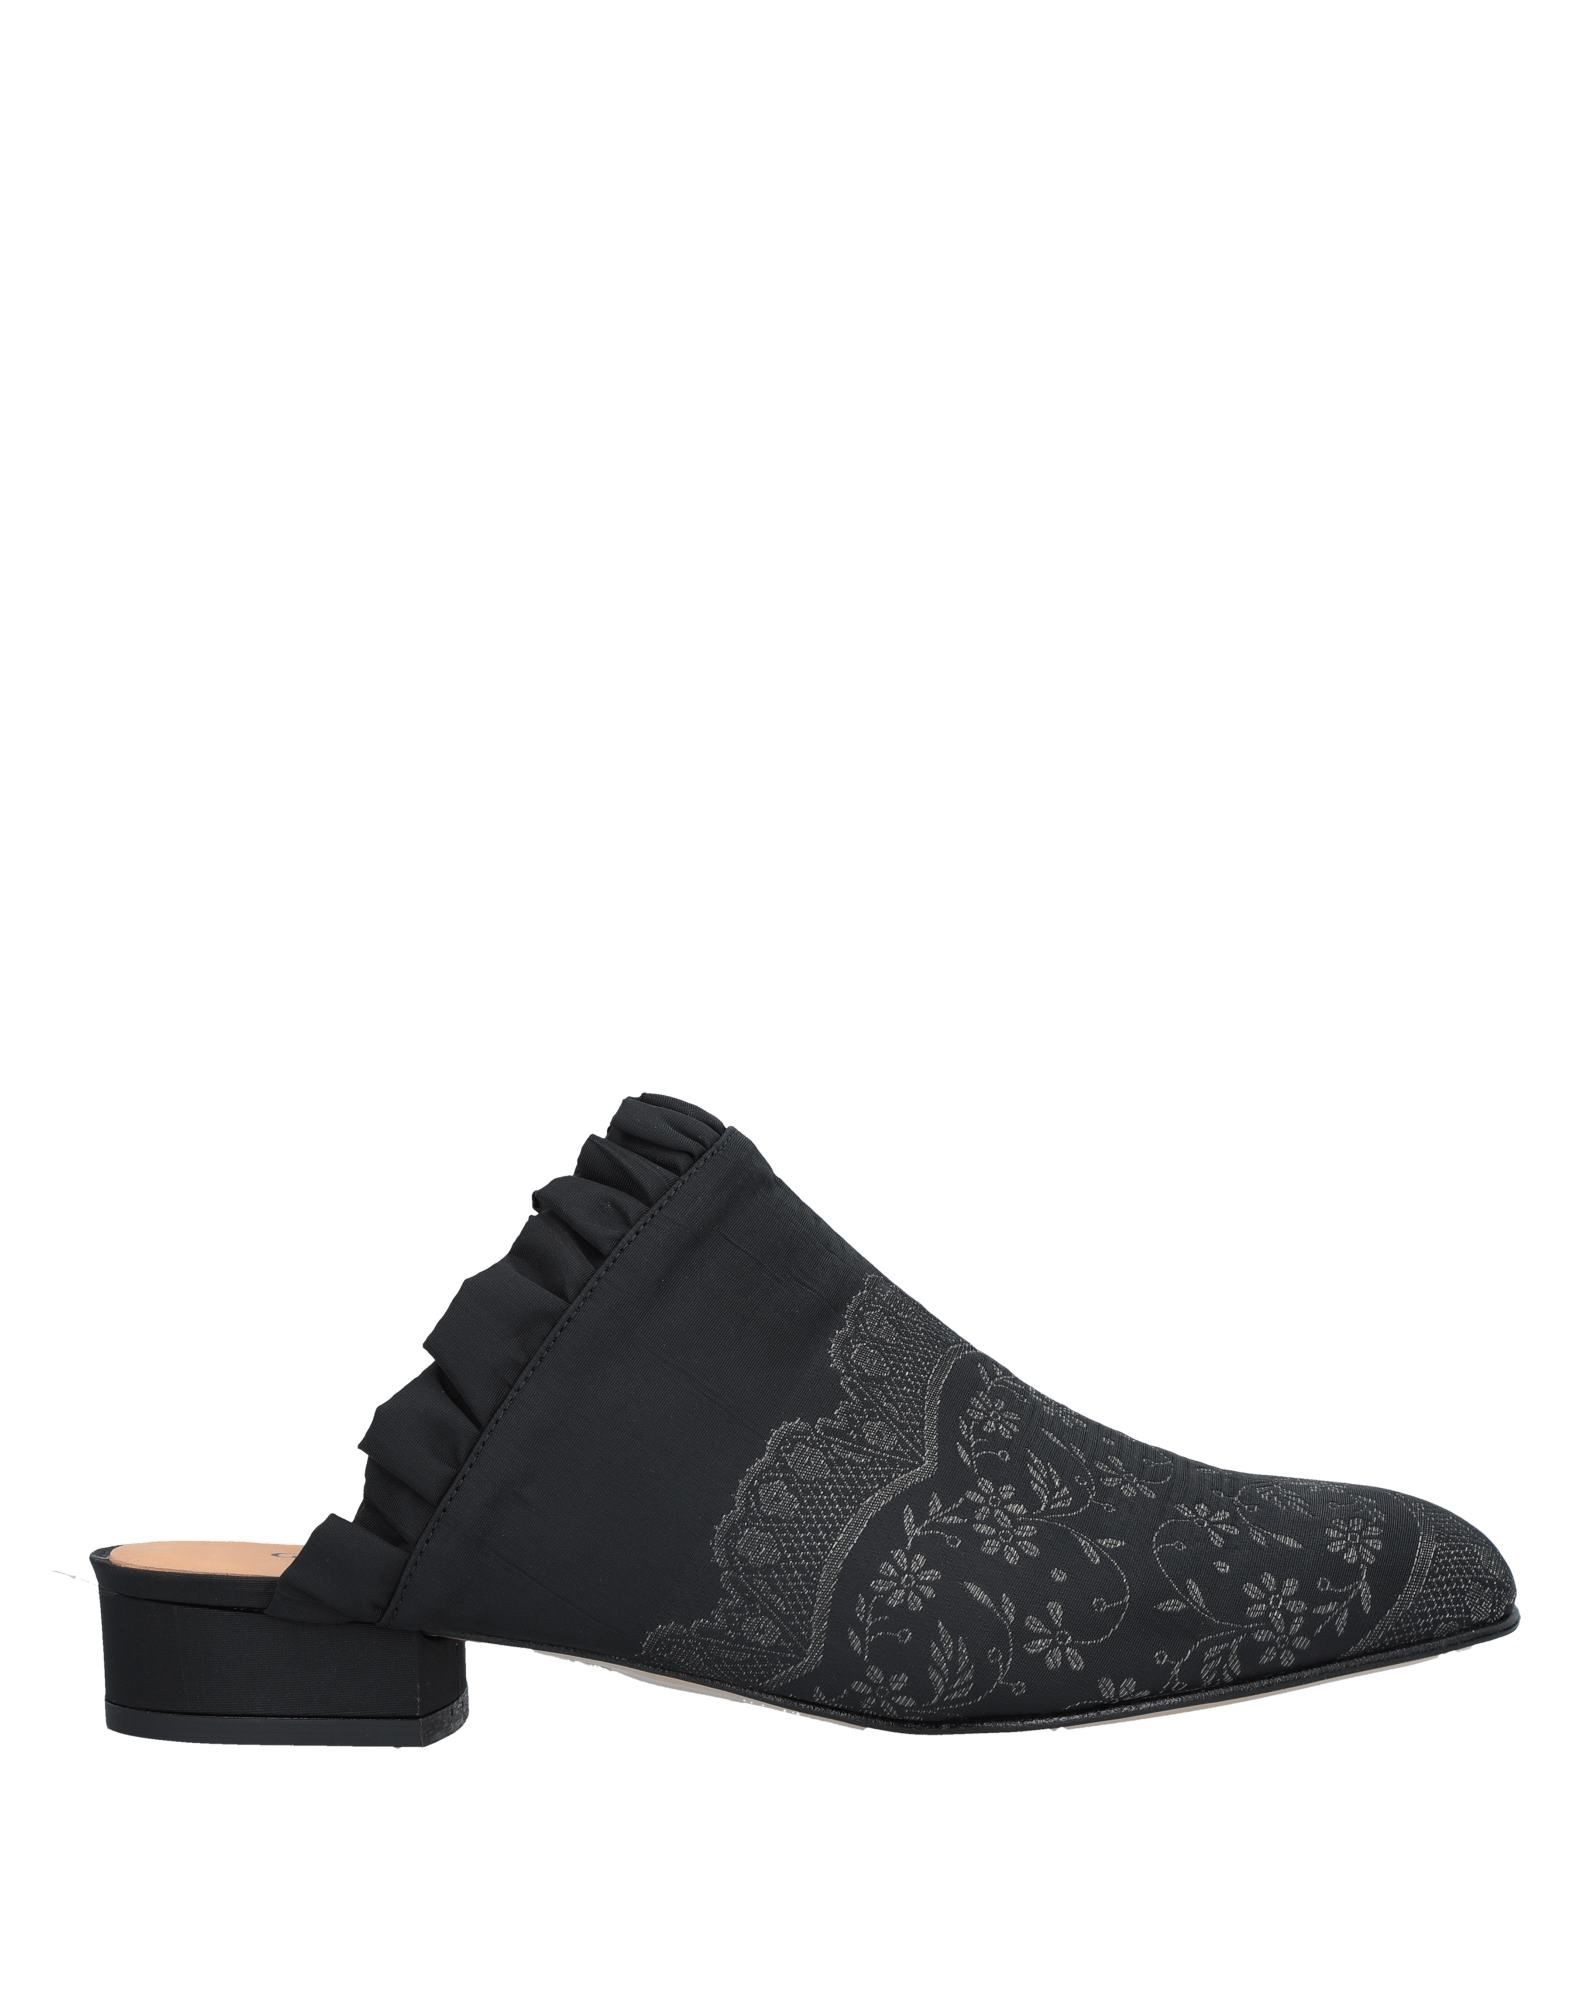 Stivaletti Nuove Cafènoir Donna - 11479671LE Nuove Stivaletti offerte e scarpe comode 4ea460